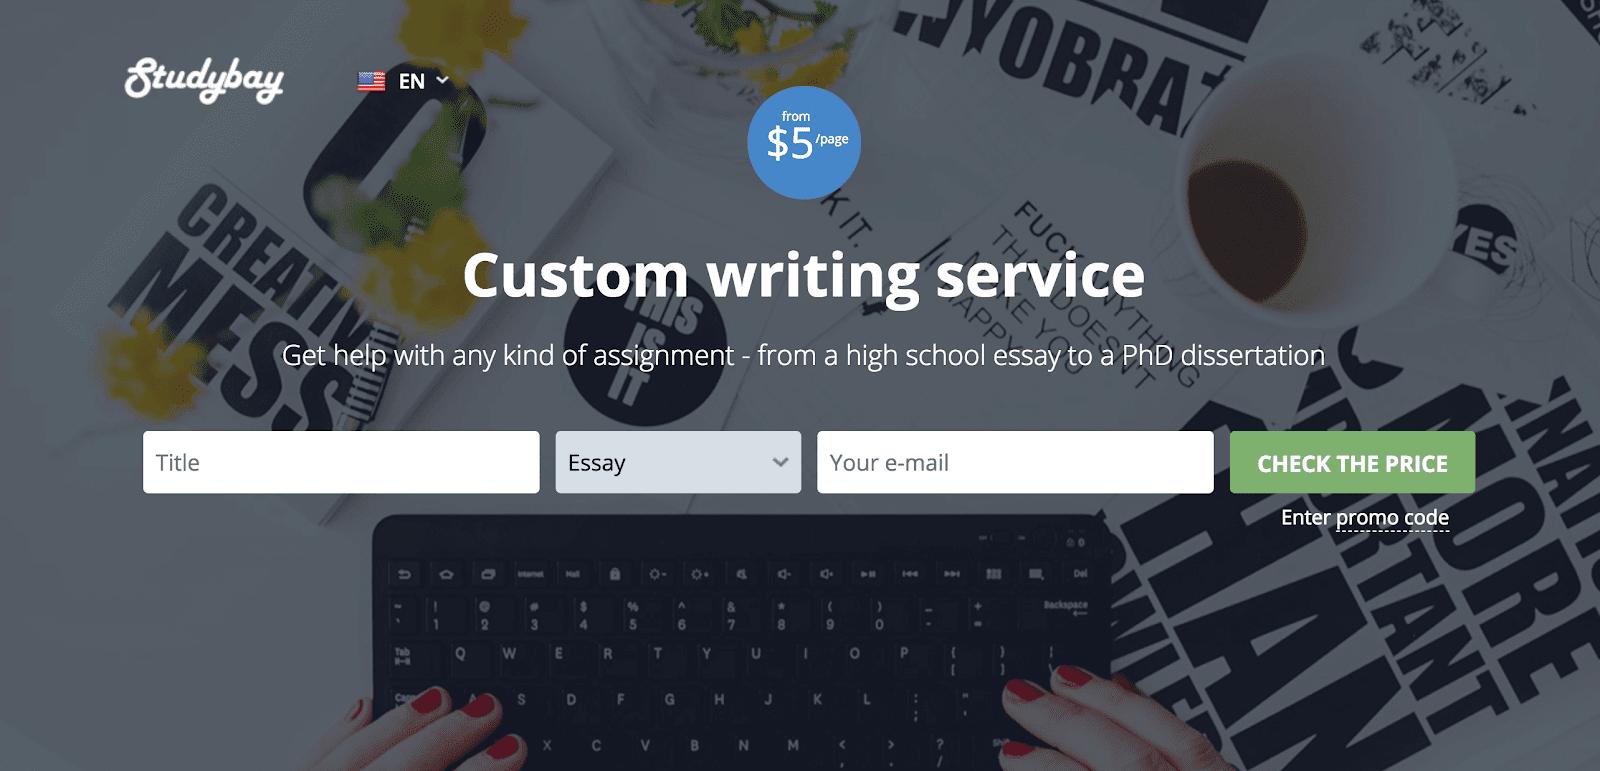 studybay order form